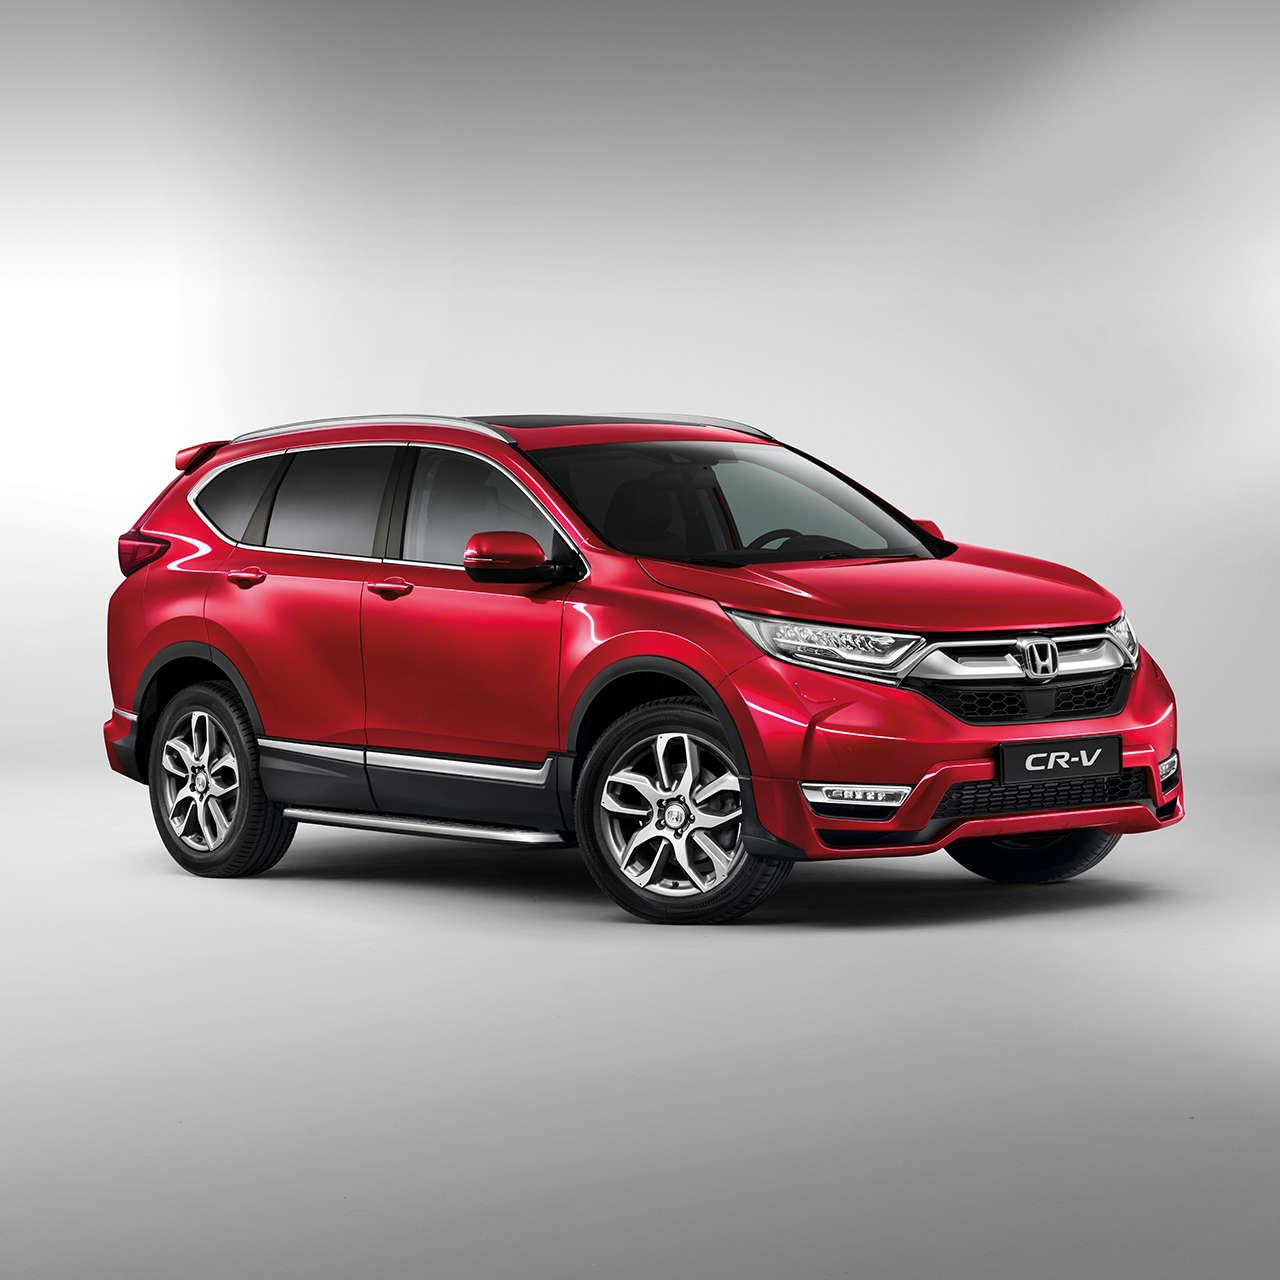 2019 Honda Civic I Dtec Specs: Honda Crv 2019 Executive Honda CRV REVIEW Allnew CRV